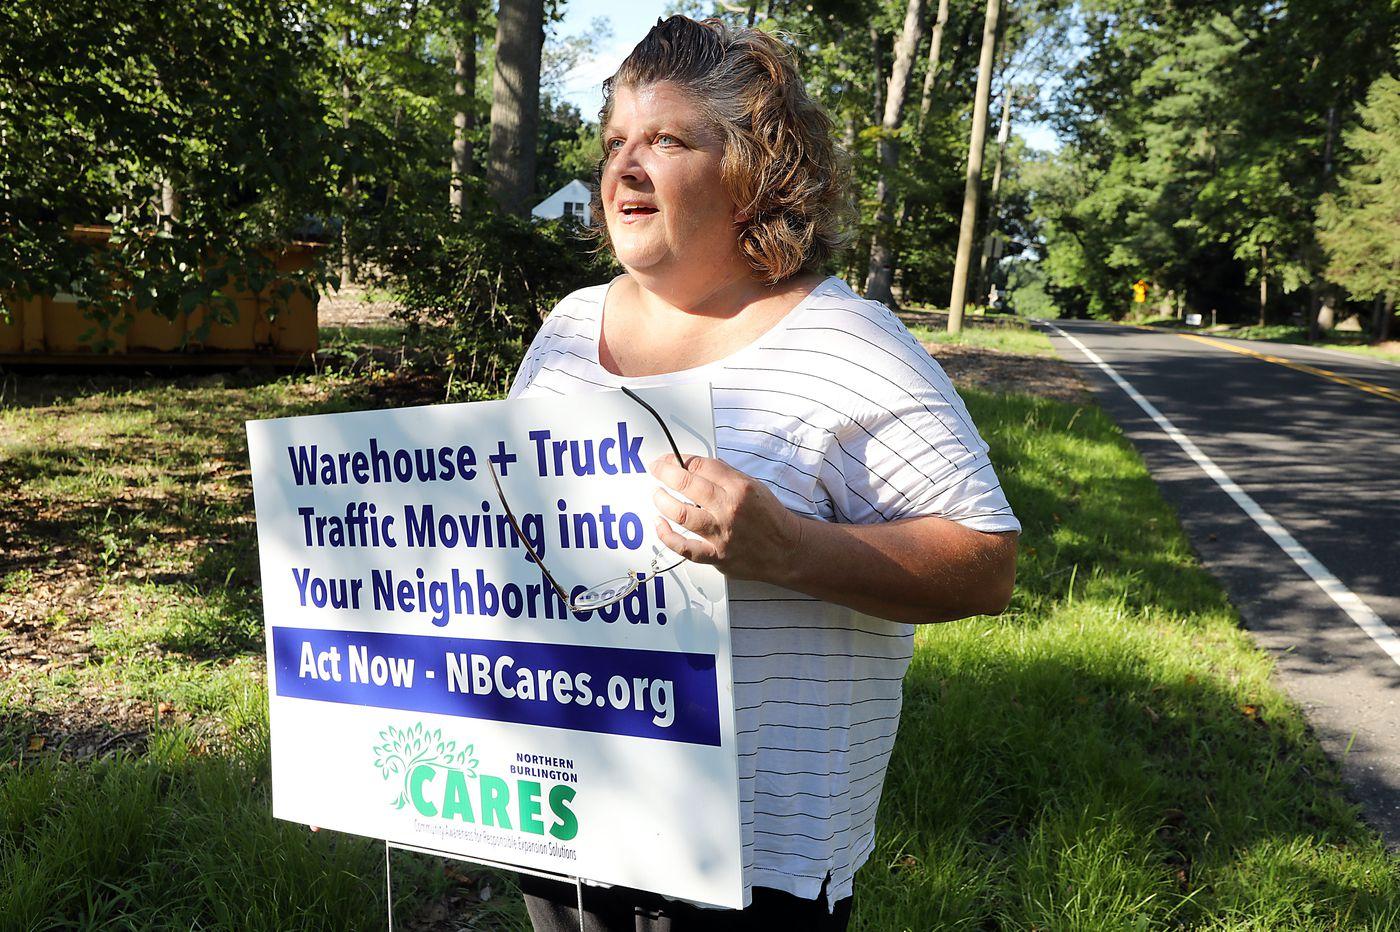 Near Amazon centers in rural Burlington County, other mega-warehouse plans stir fear of rumbling traffic